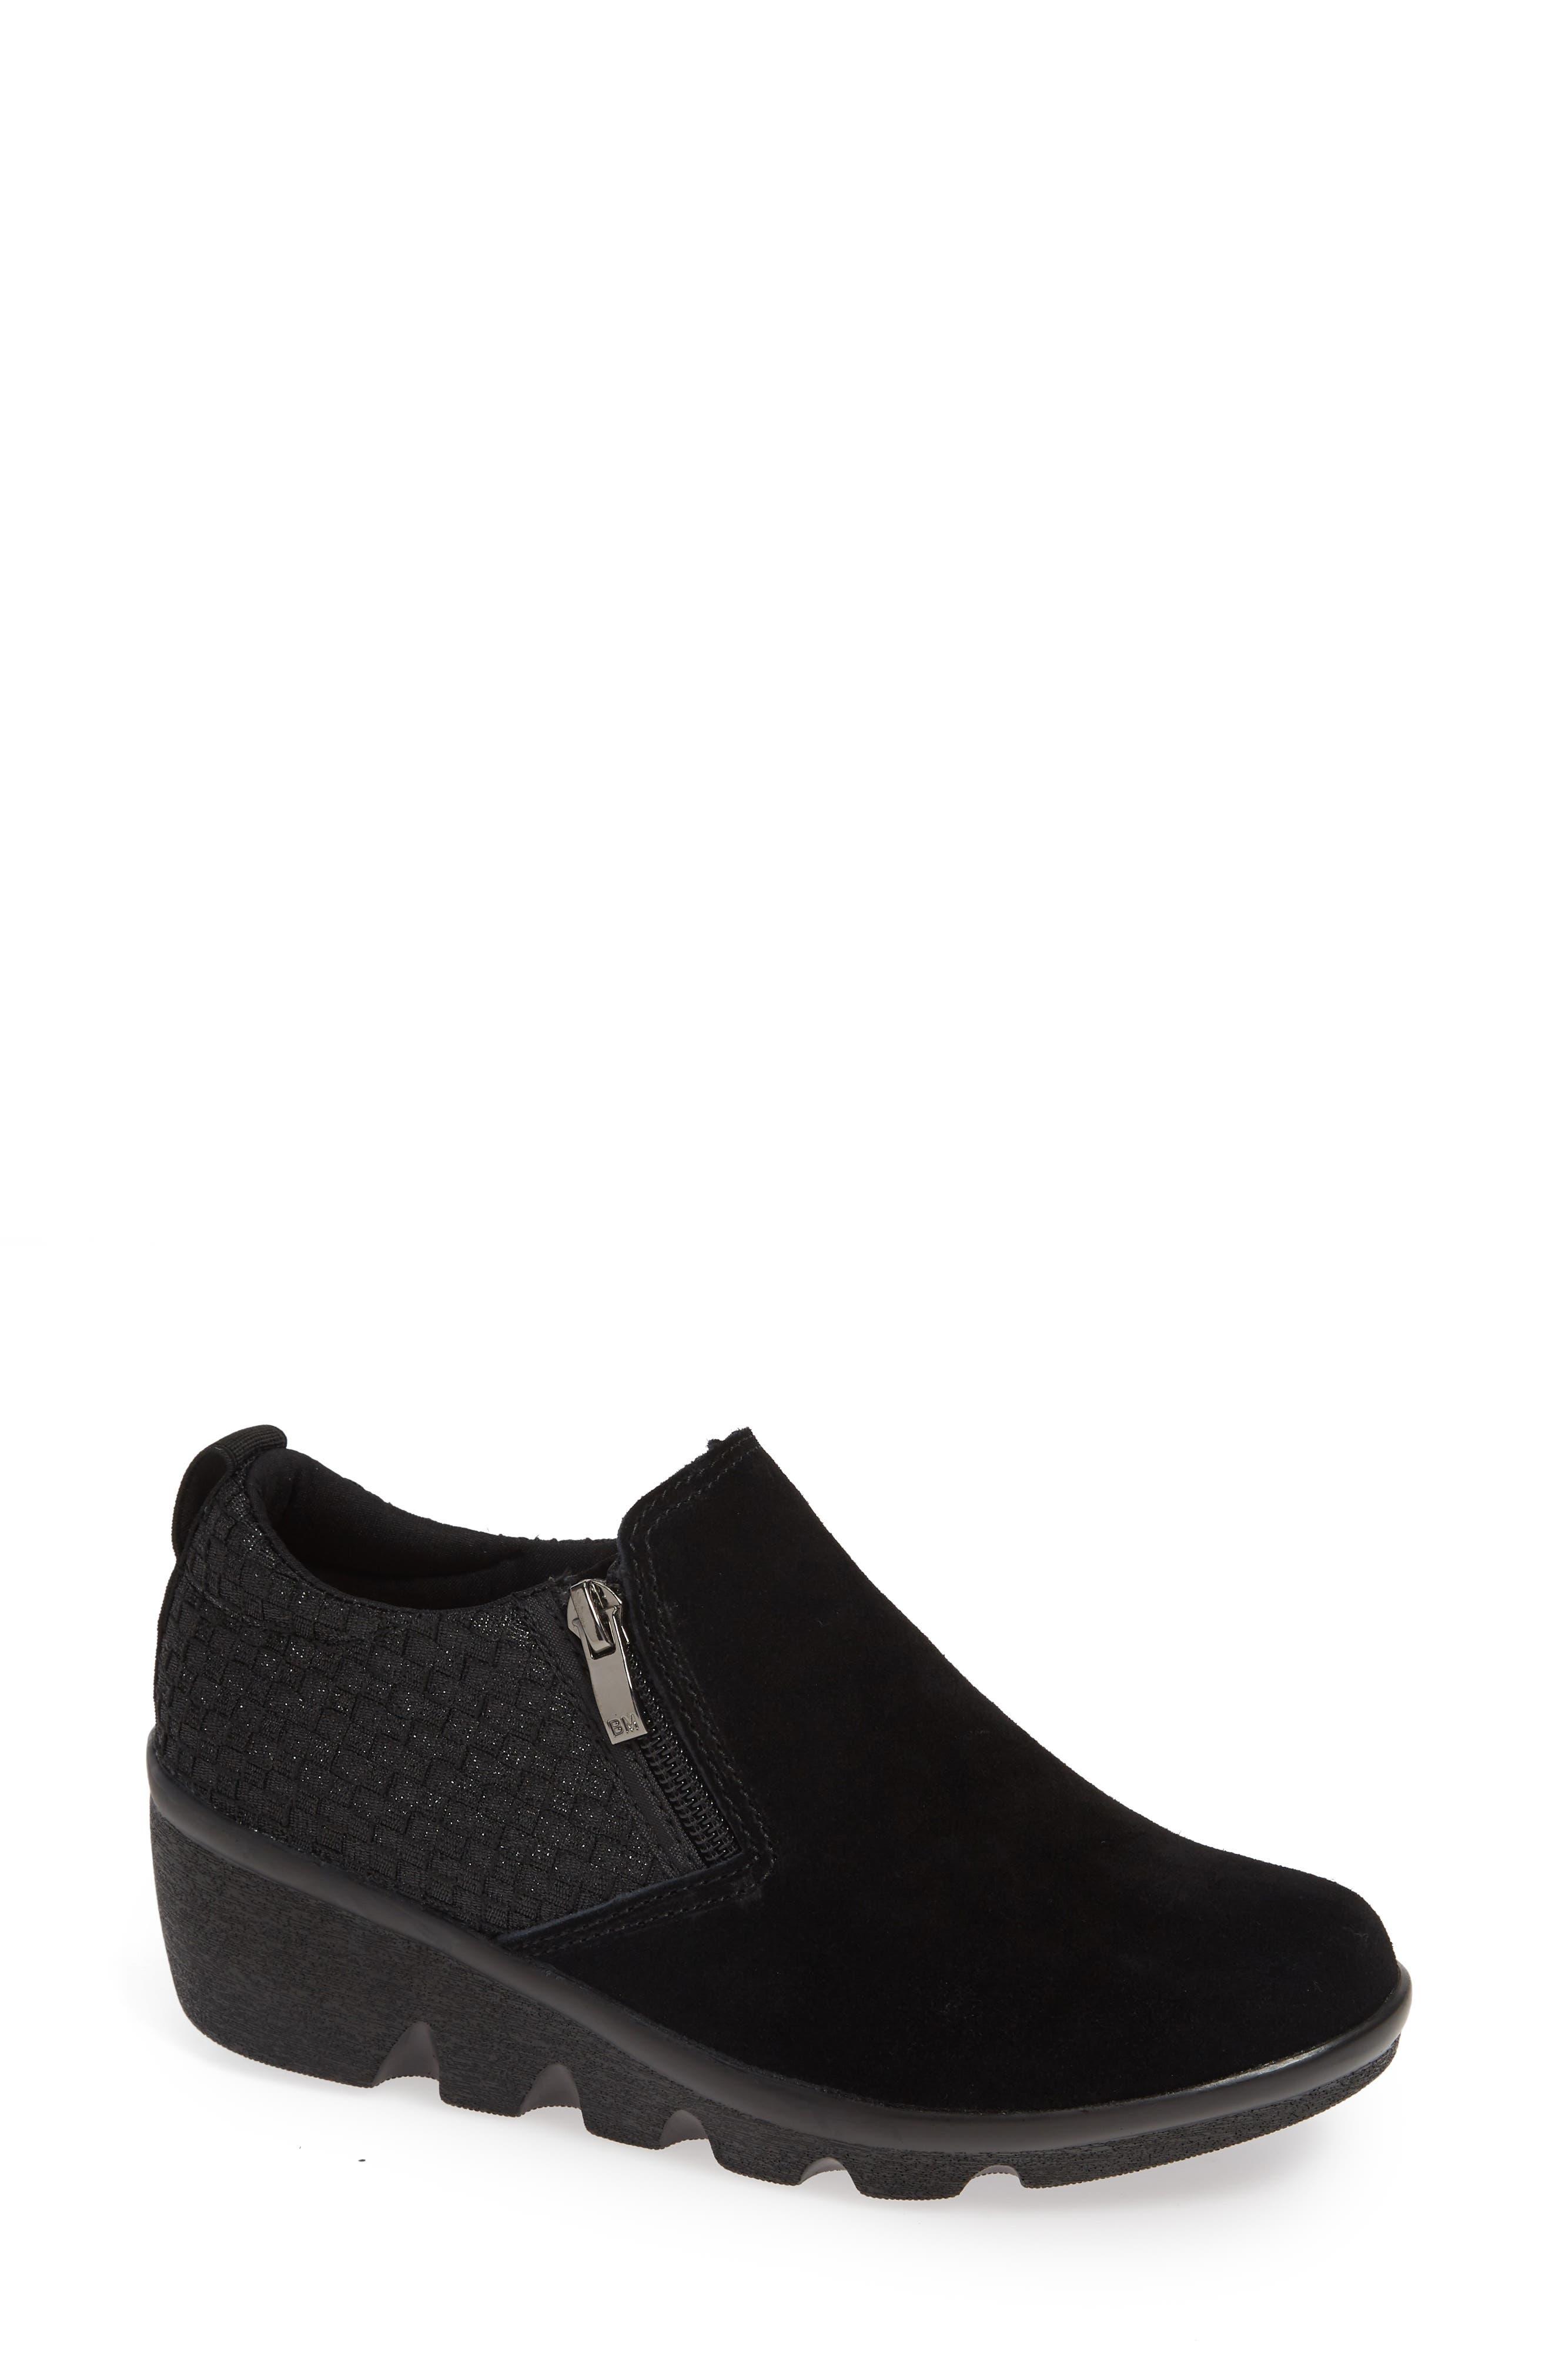 Lihi Ankle Boot,                             Main thumbnail 1, color,                             BLACK METALLIC LEATHER